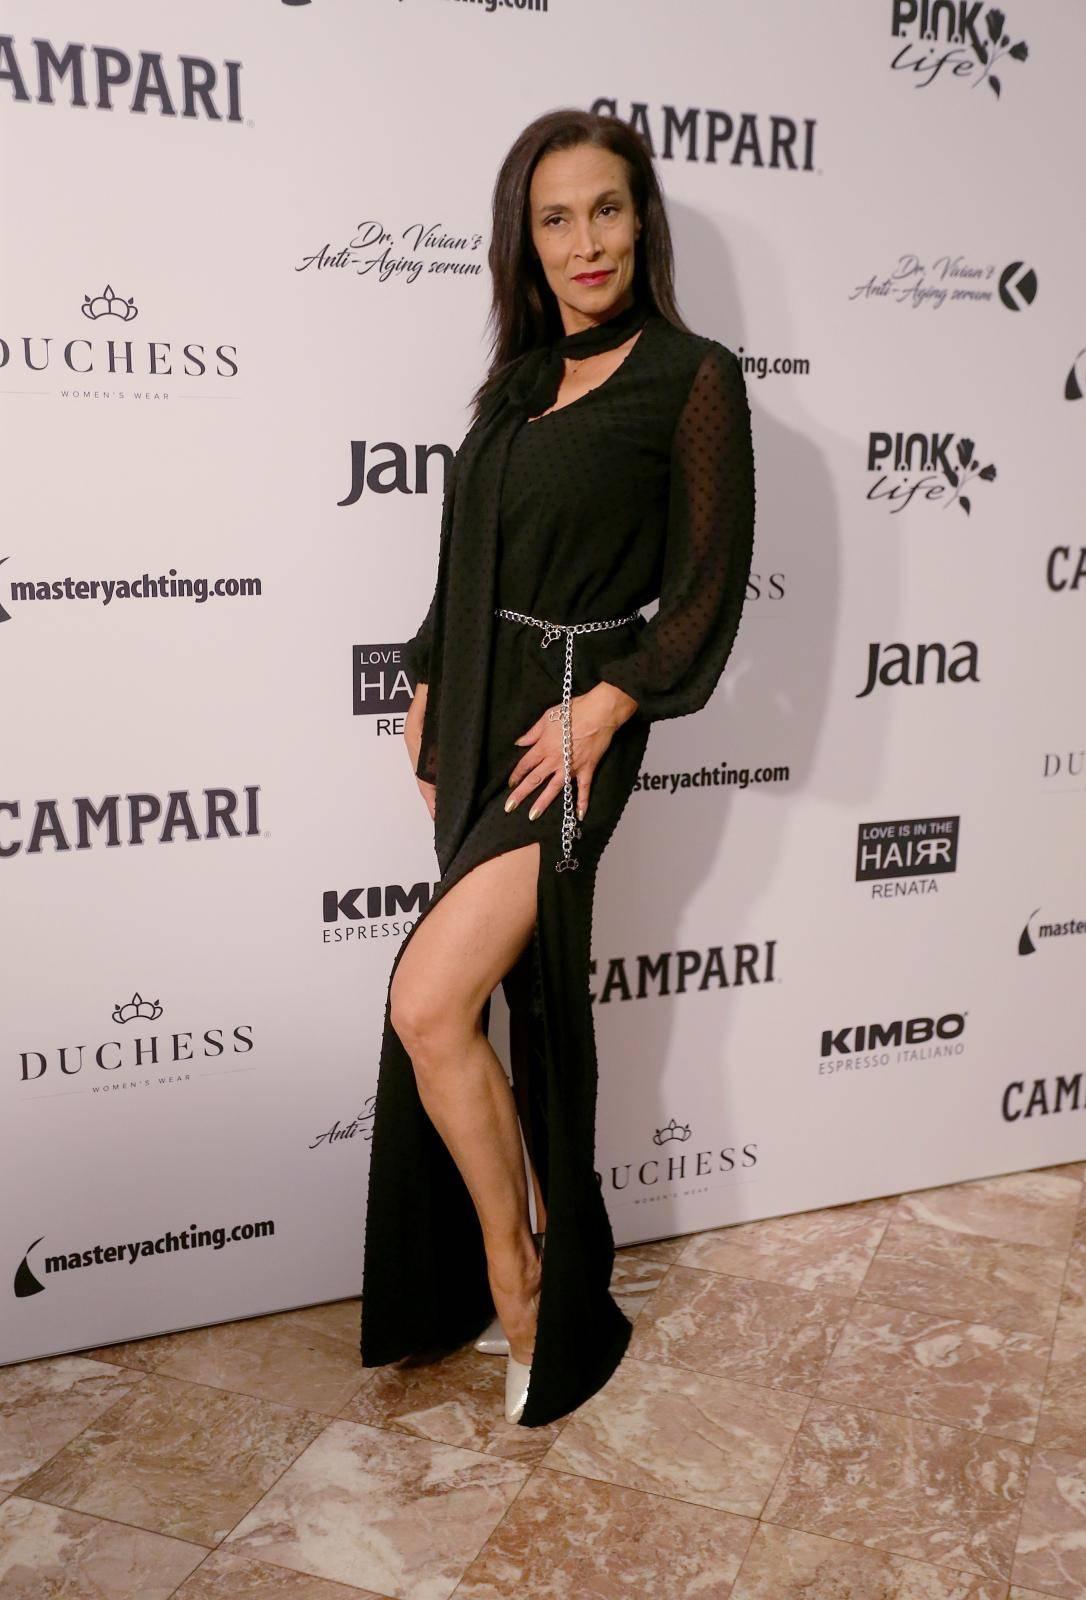 Zagreb: U plači Dverce održana modna revija Duchess modnog brenda Snježane Mehun